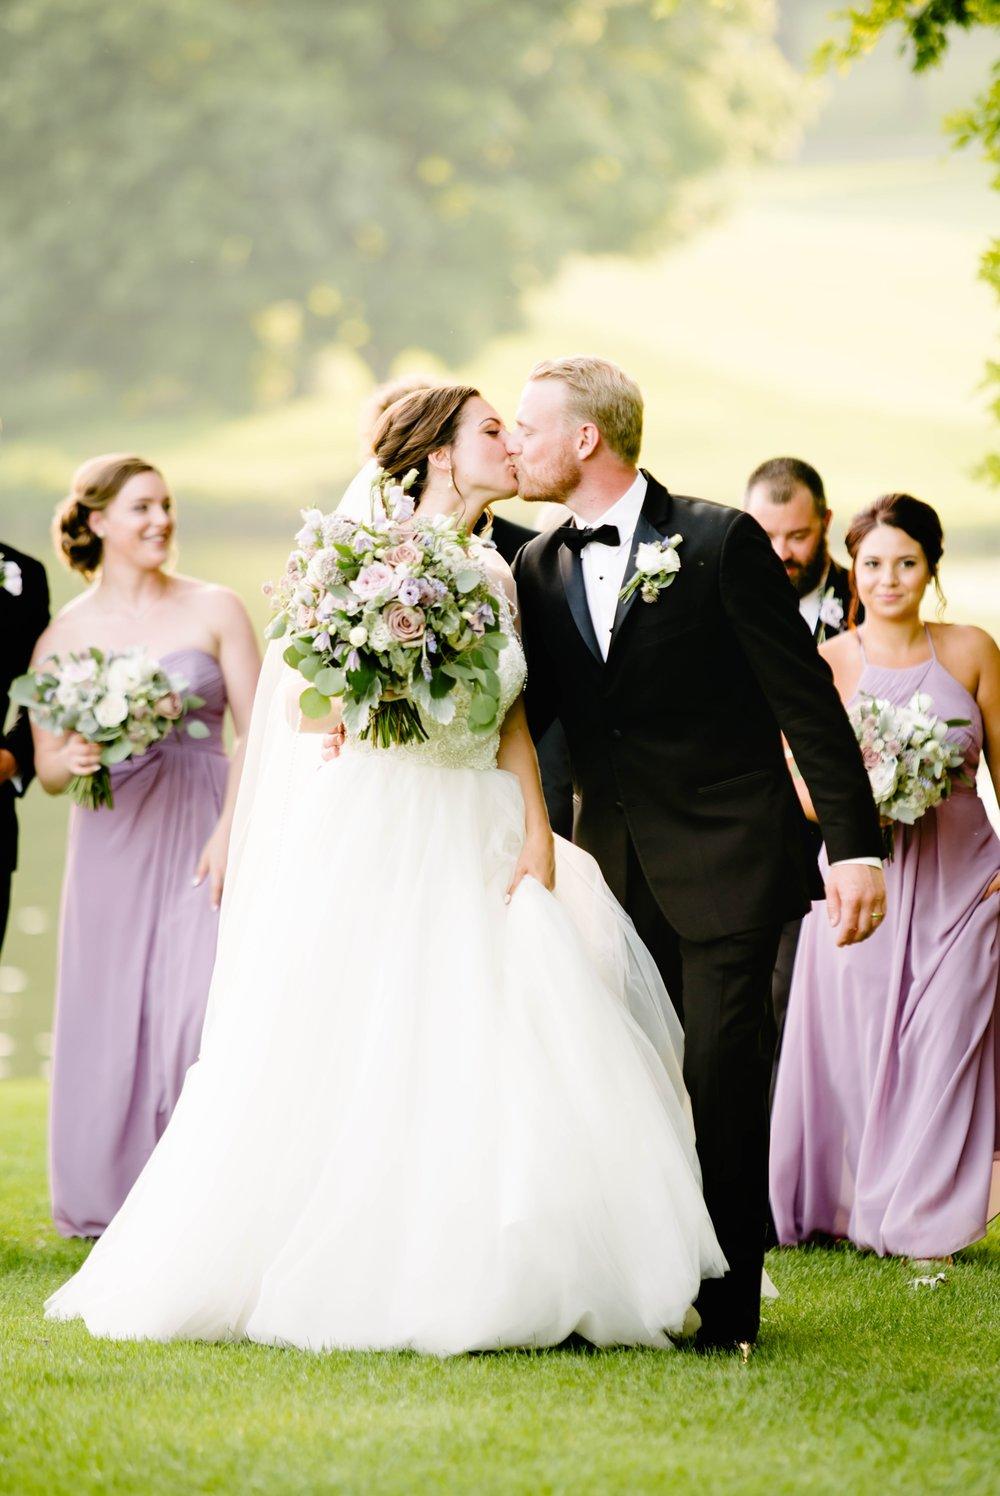 chicago-fine-art-wedding-photography-zuidema29